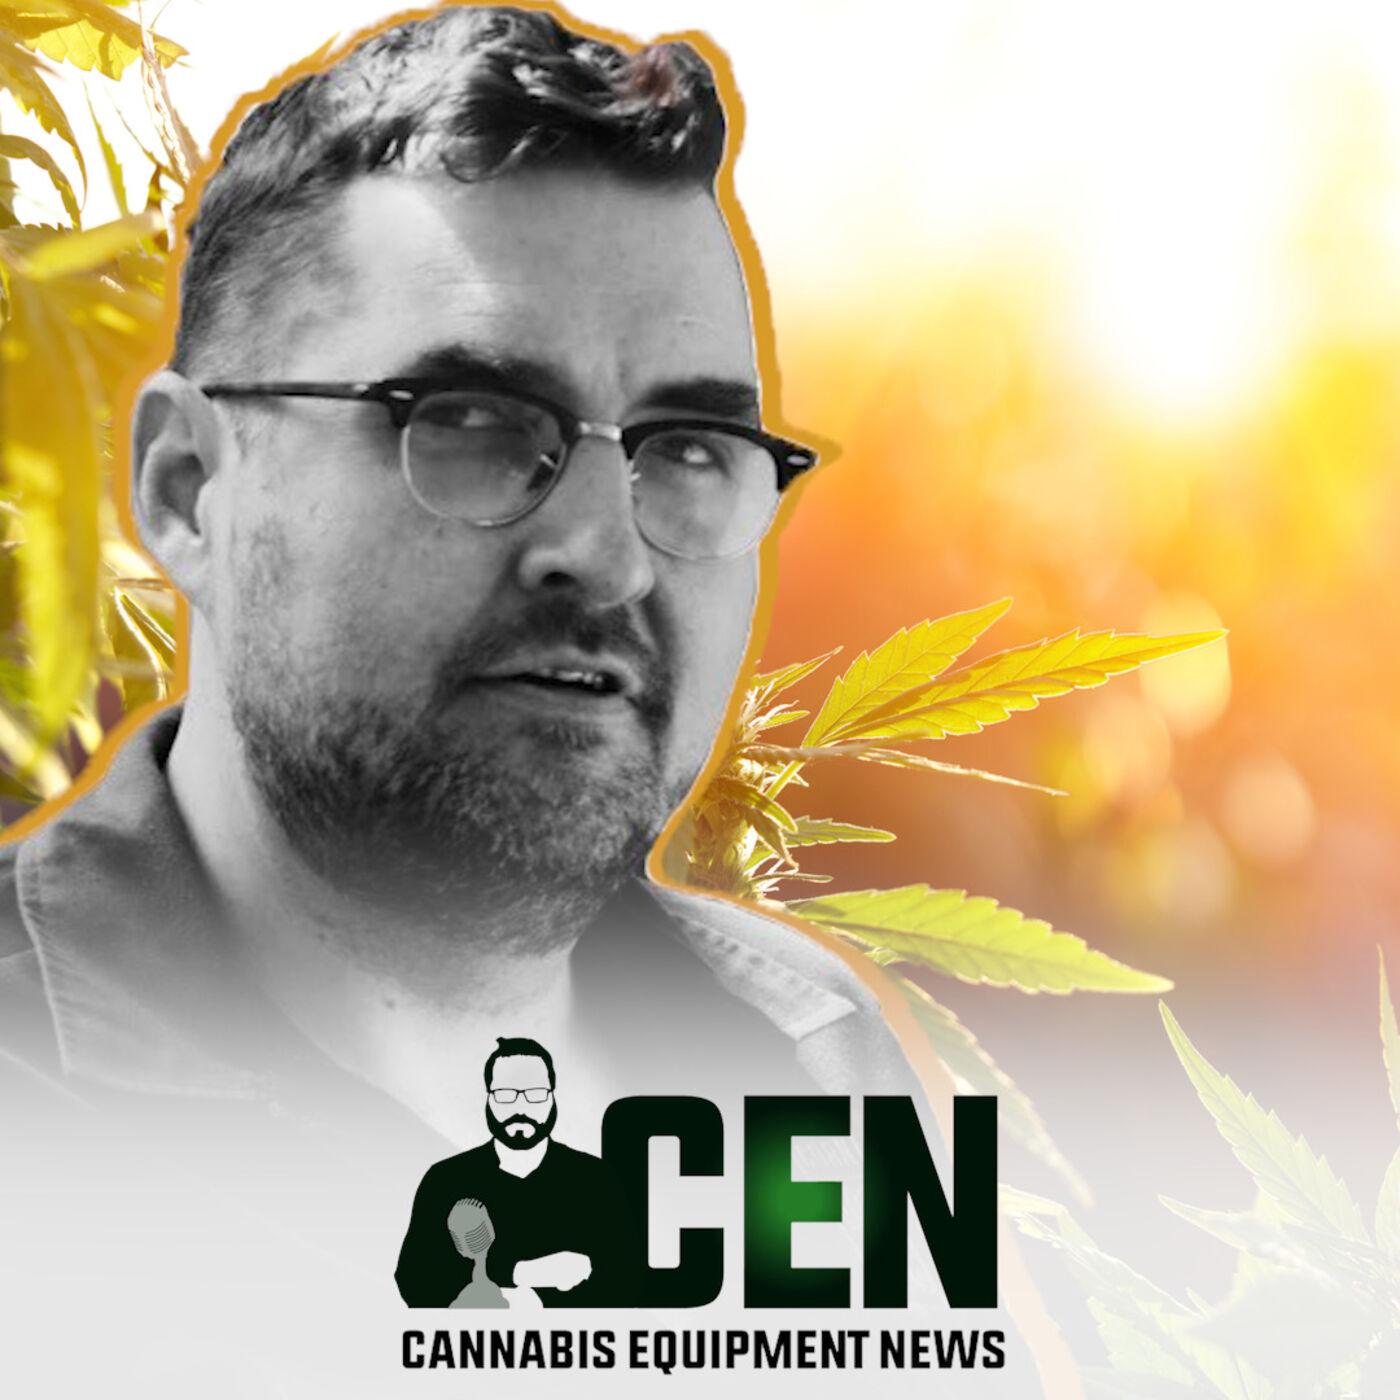 Jim Higdon: Exposing Shady CBD Practices